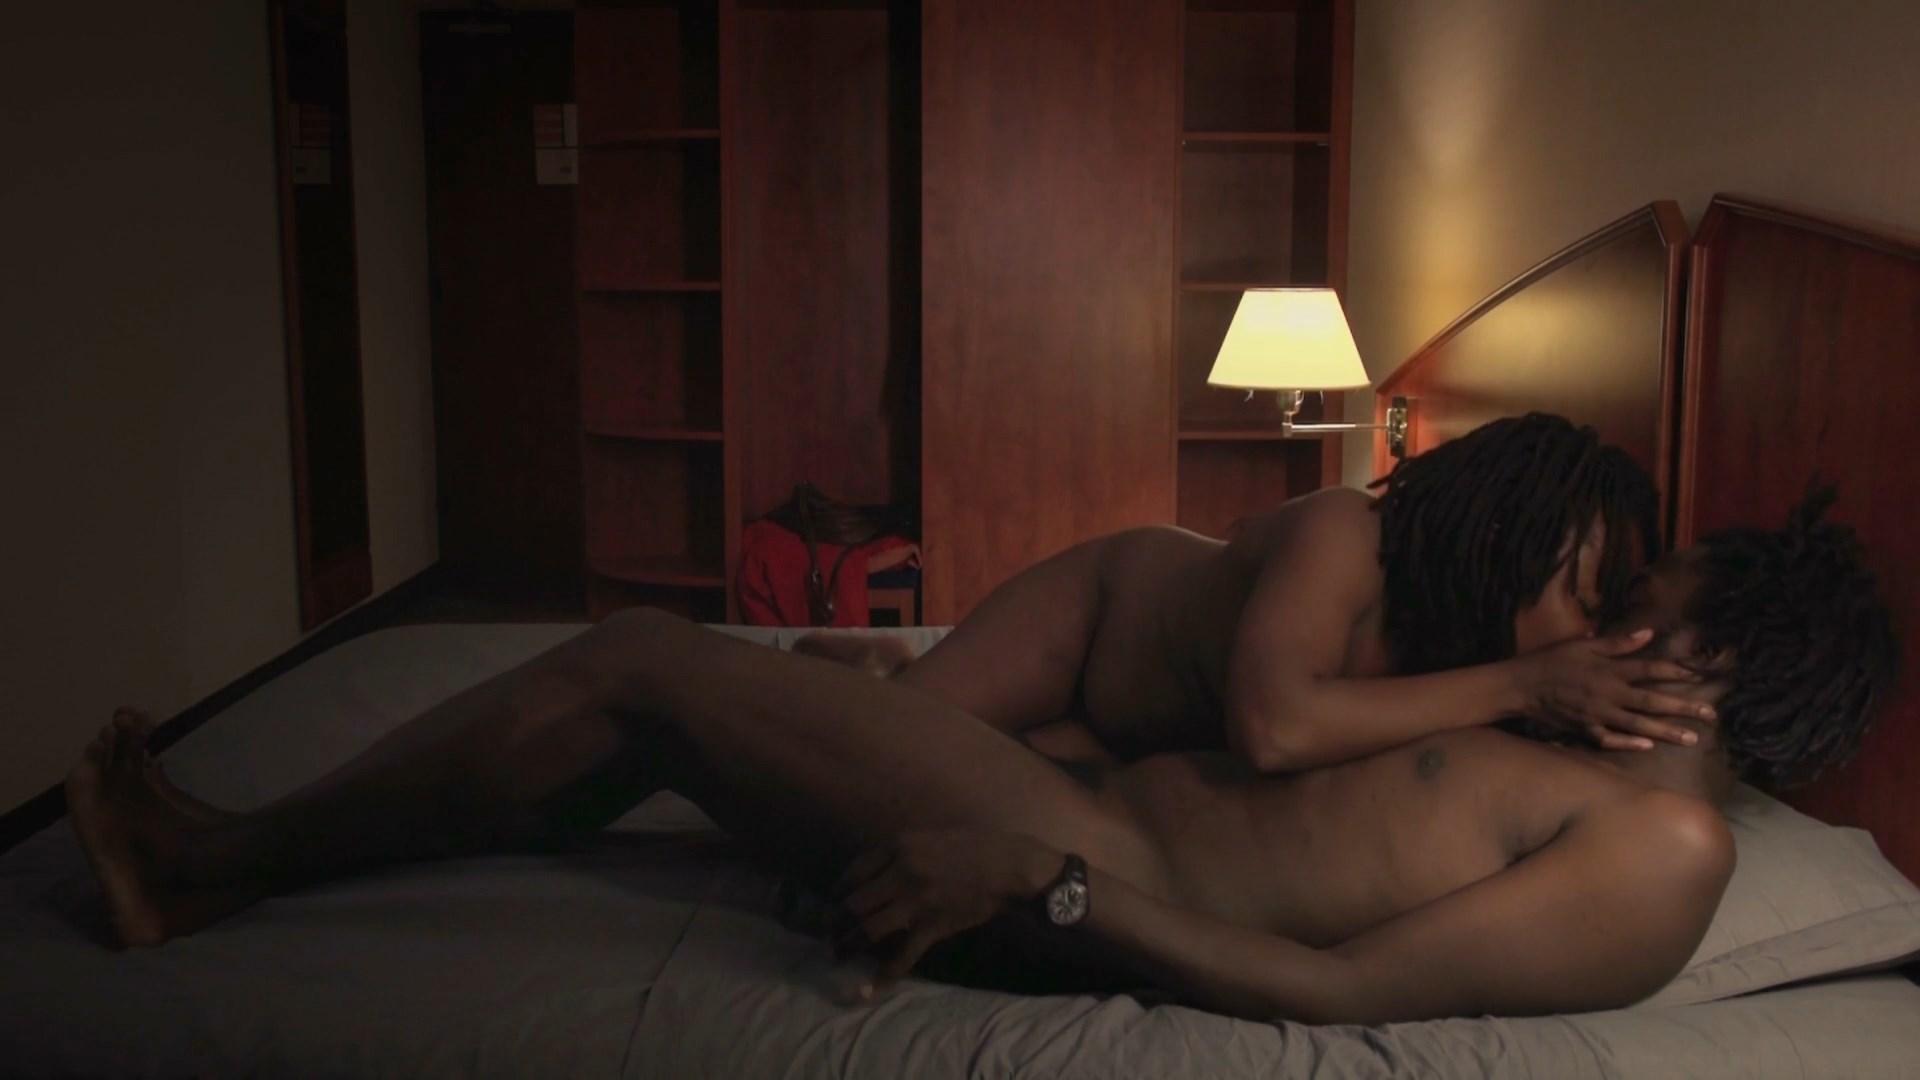 Ana Ayora Nuda nude video celebs » alvie bitemo nude - nevers (2013)